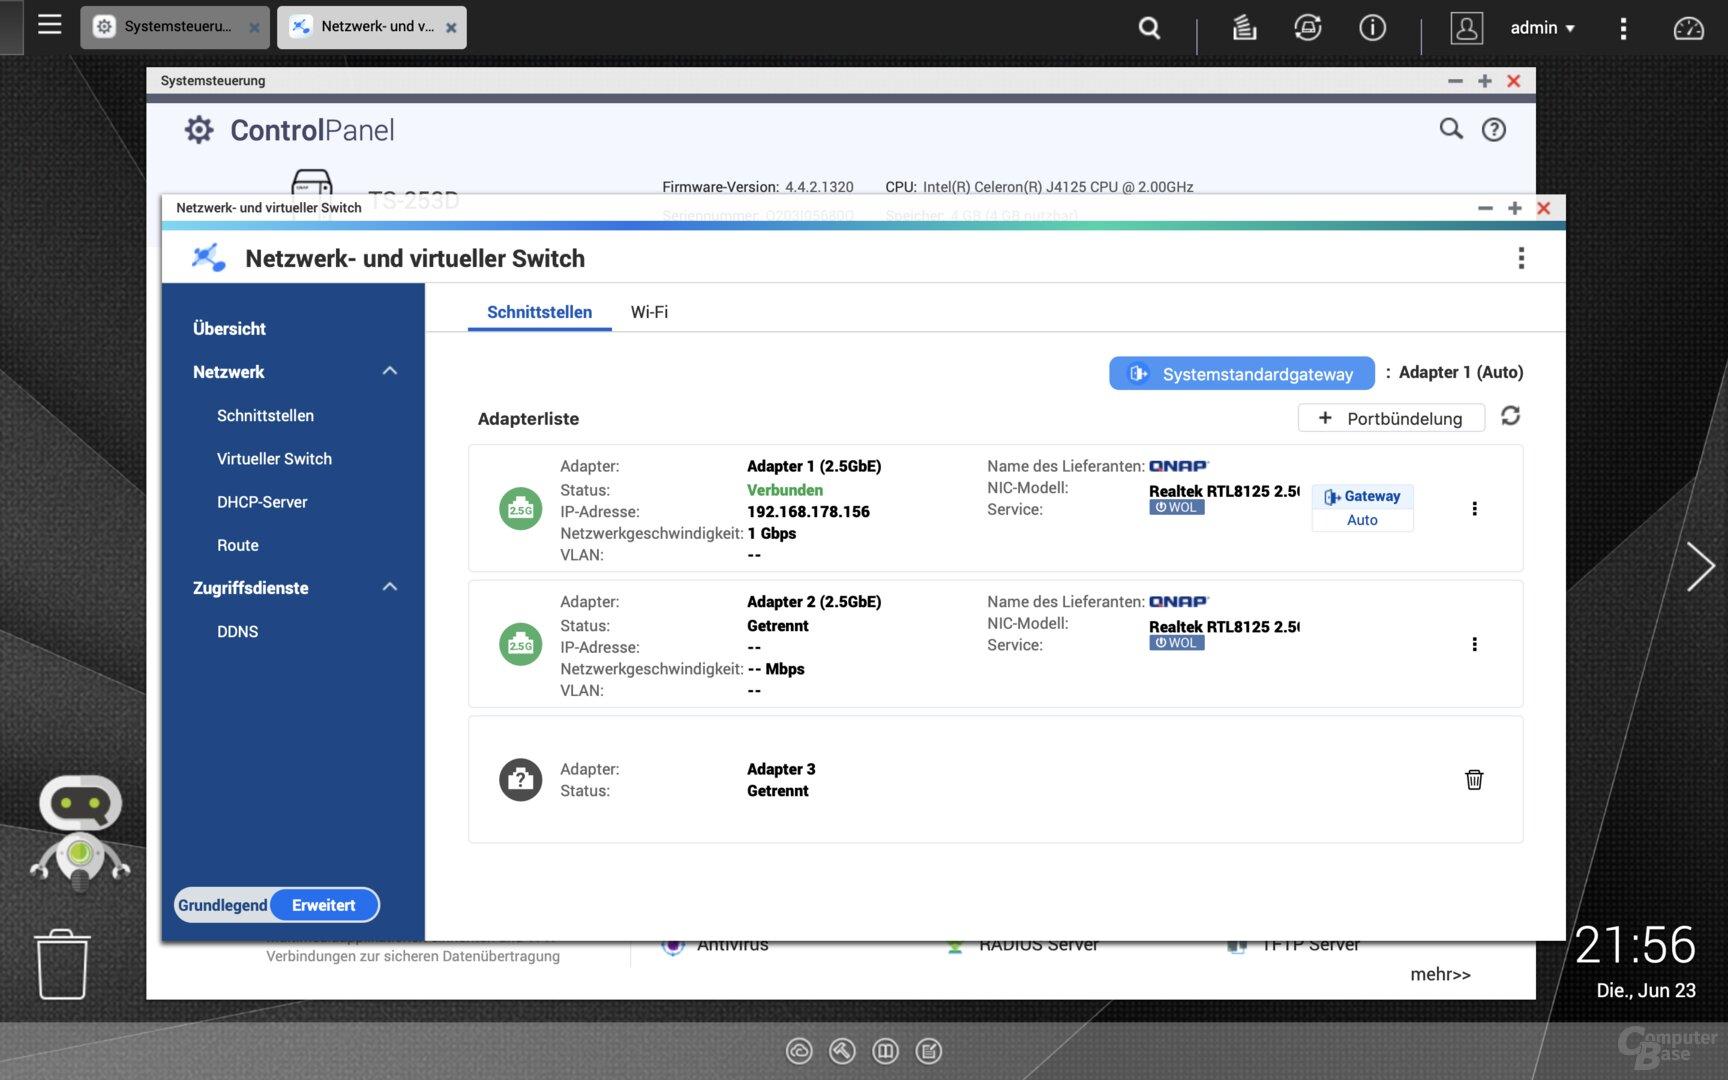 QNAP QTS 4.4.2 auf der TZS-253D